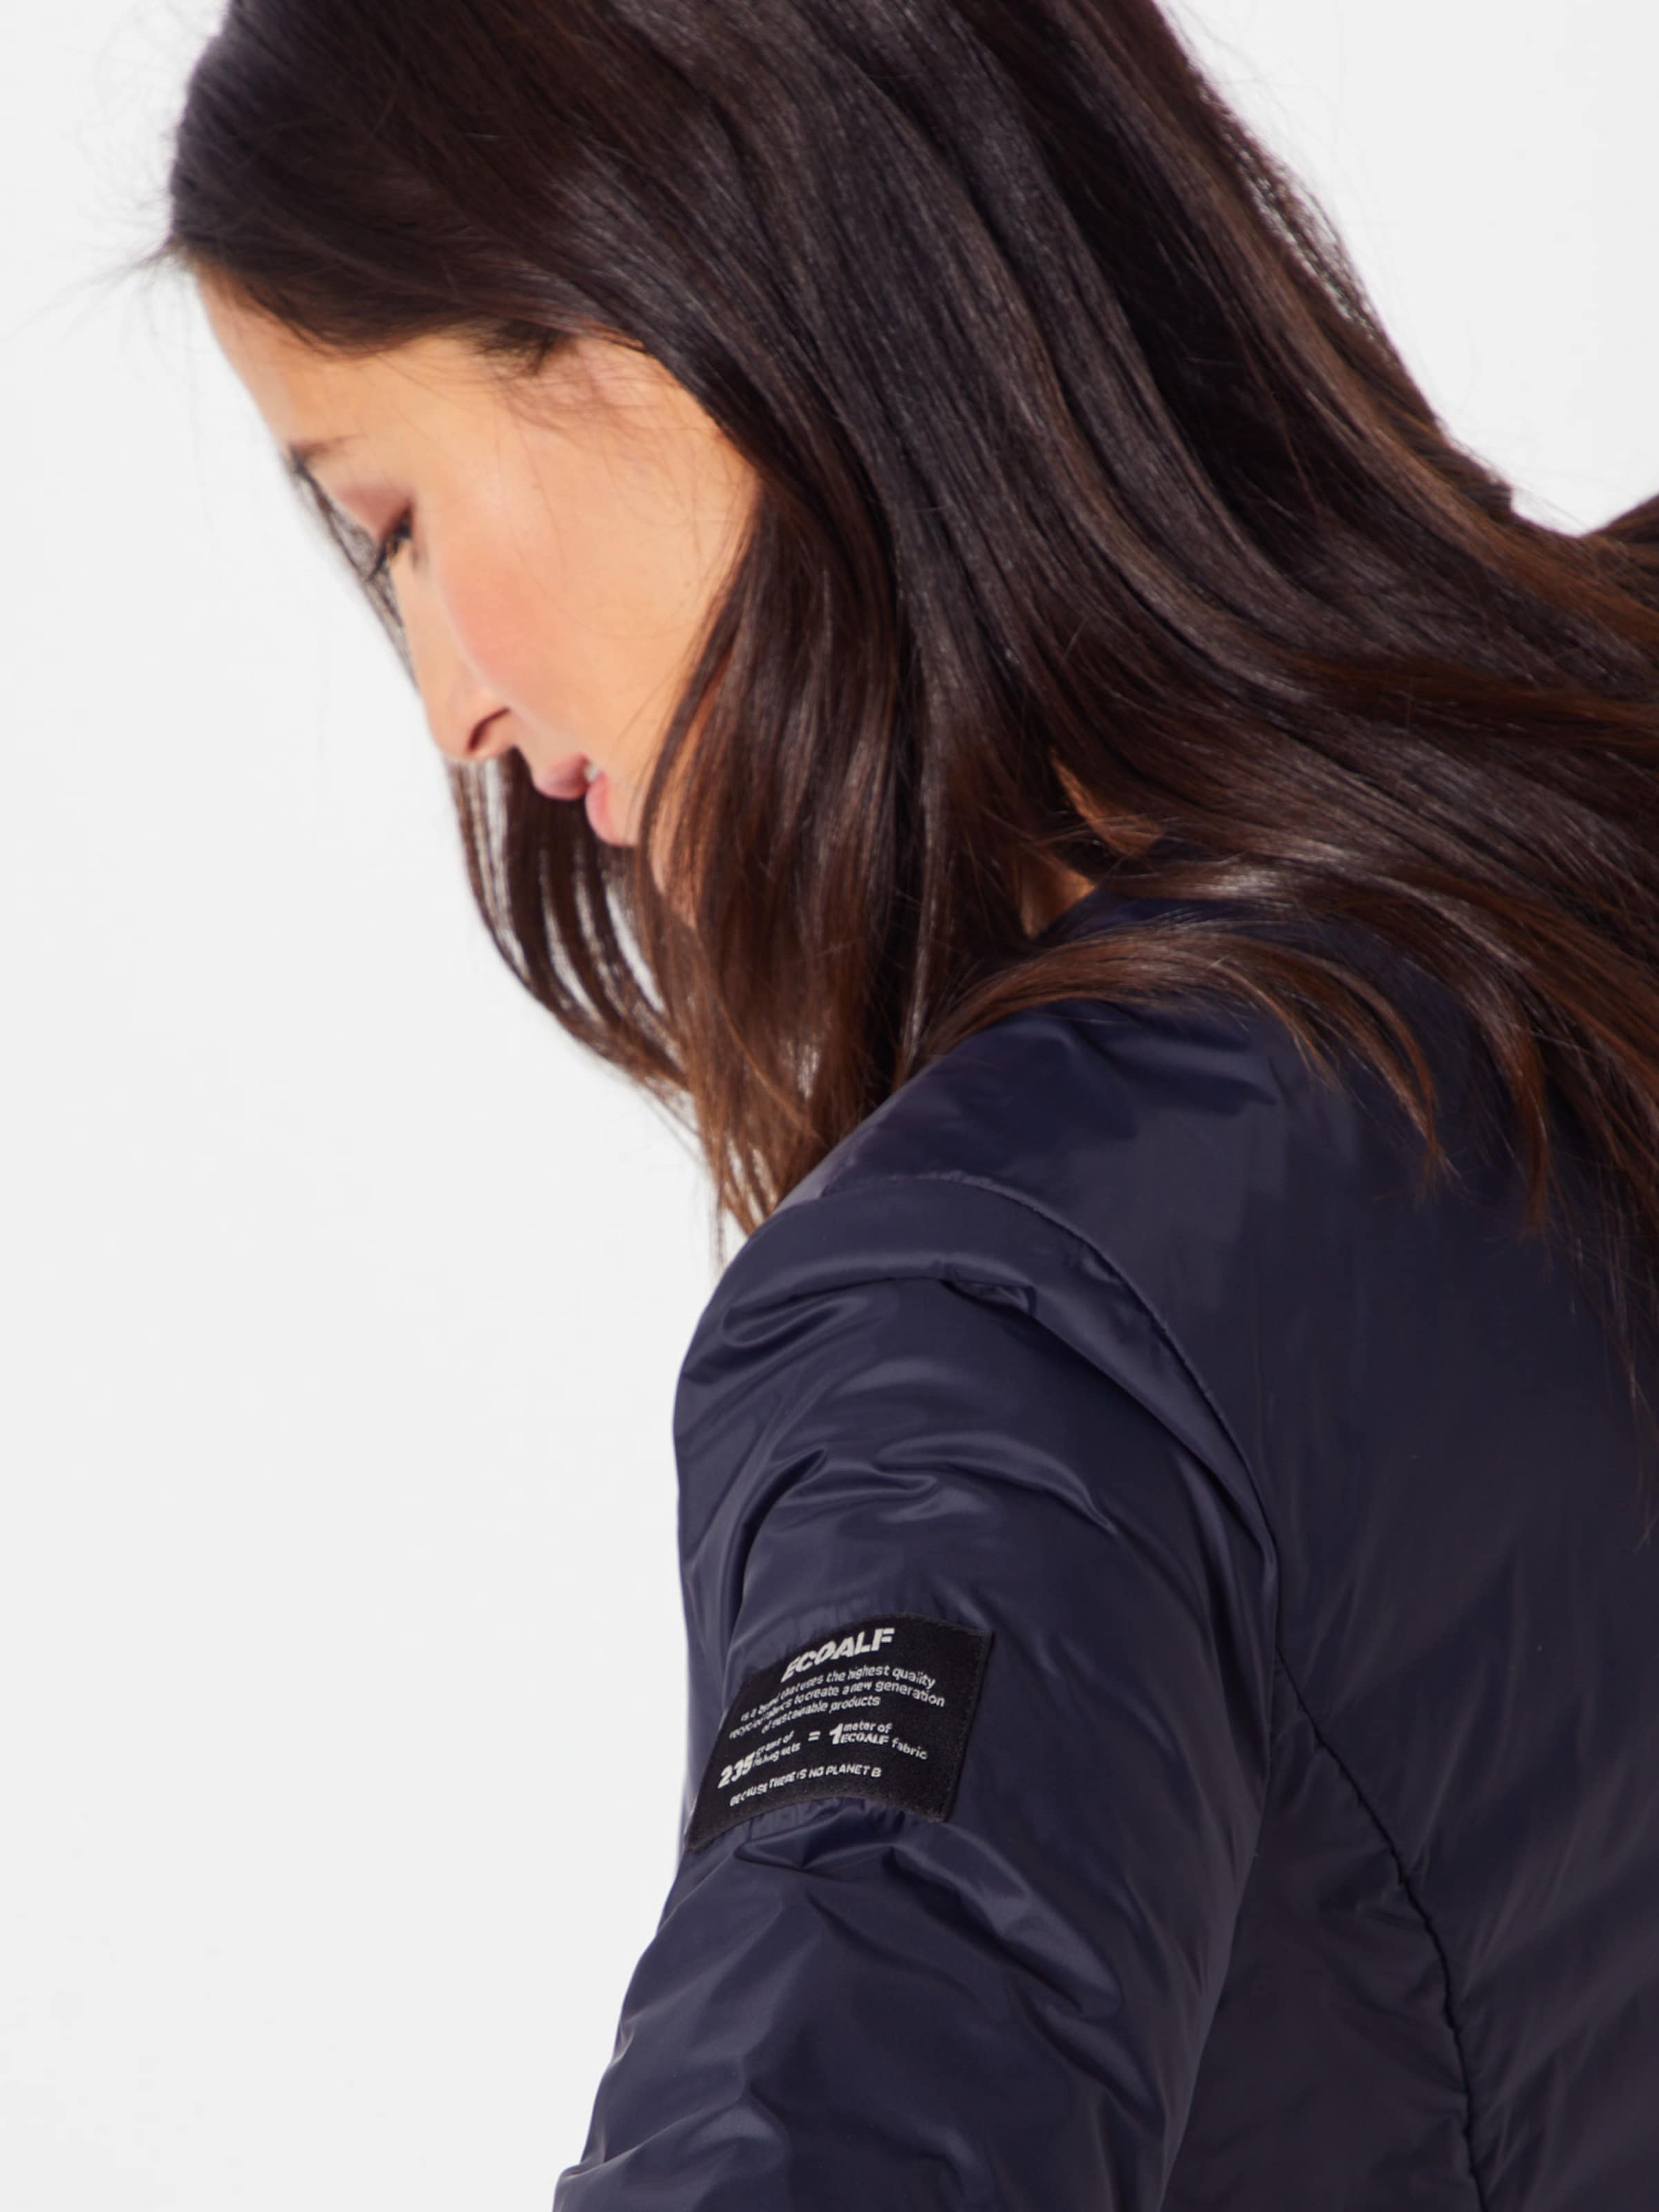 saison Marine Mi Ecoalf Veste Bleu Downjacket' 'nikky En kOn0PwX8